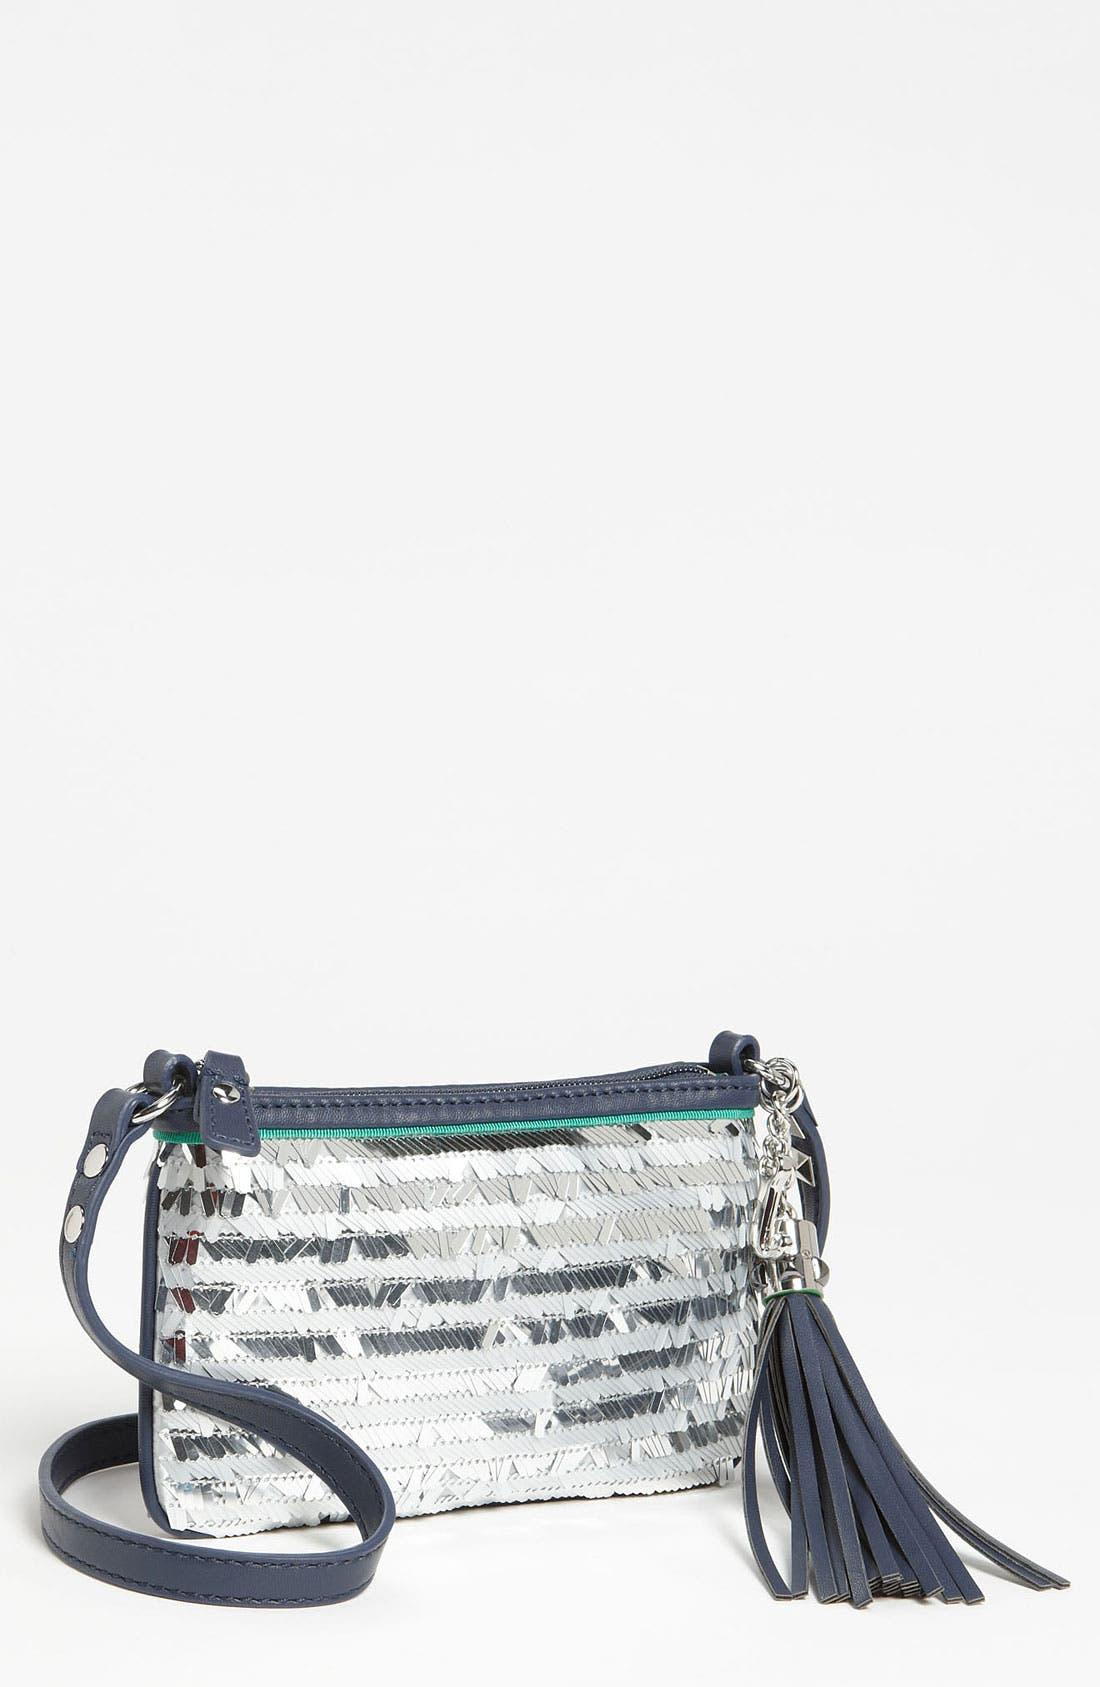 Alternate Image 1 Selected - Juicy Couture Crossbody Bag (Girls)